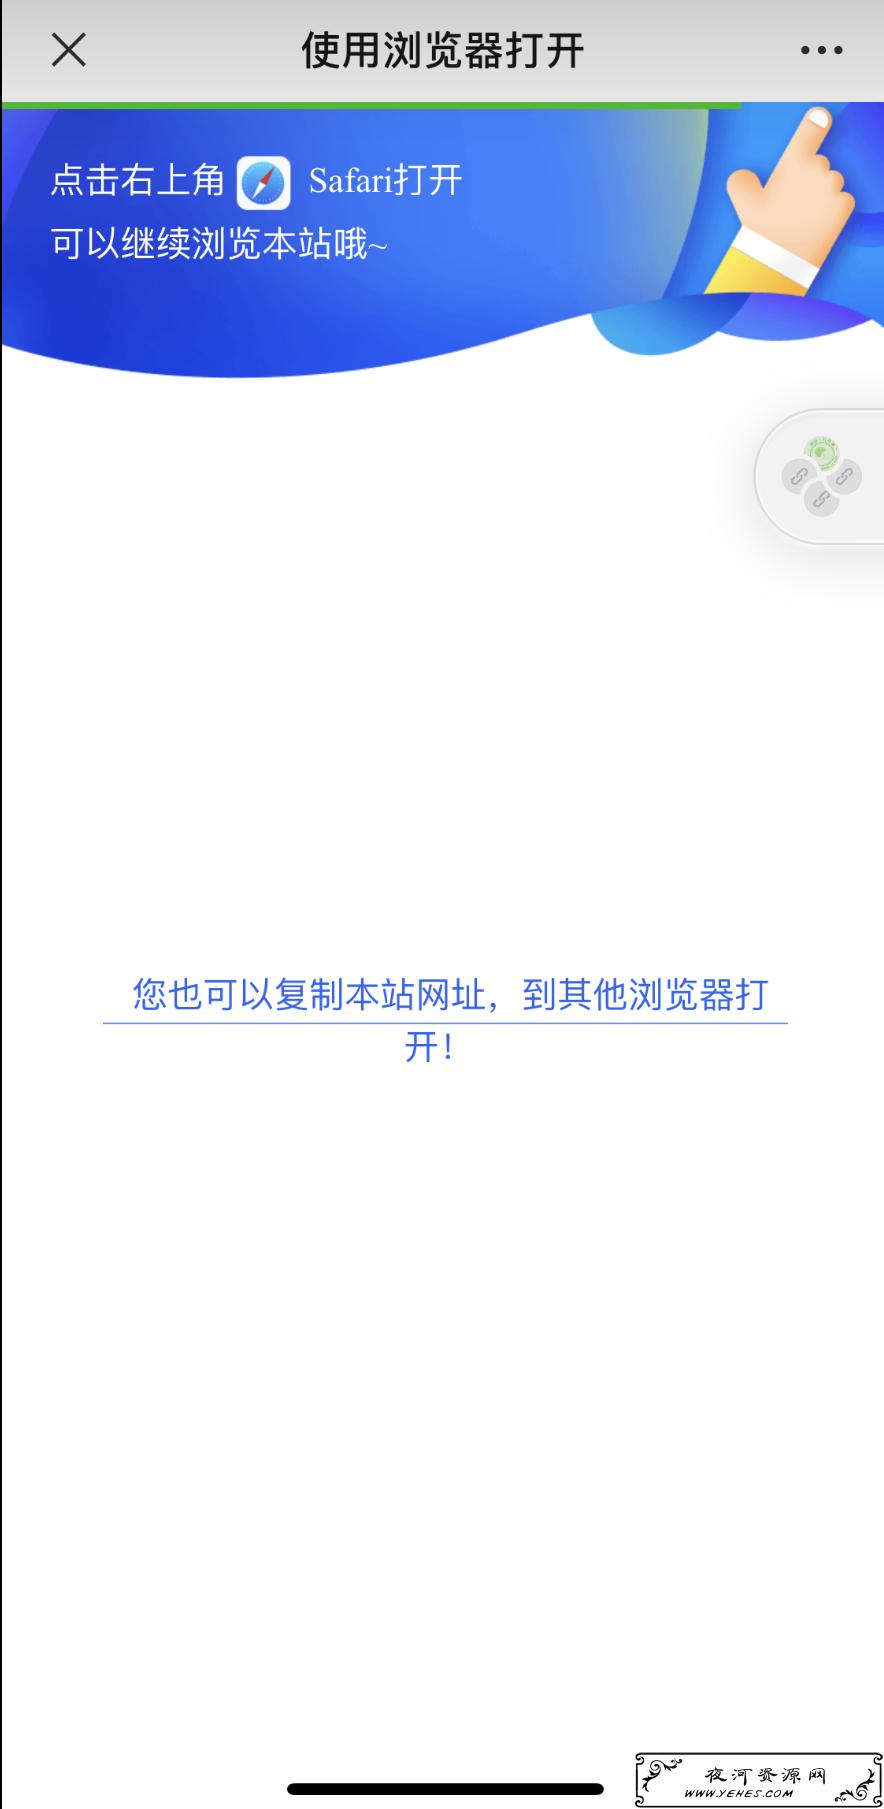 二开防红短网址PHP源码